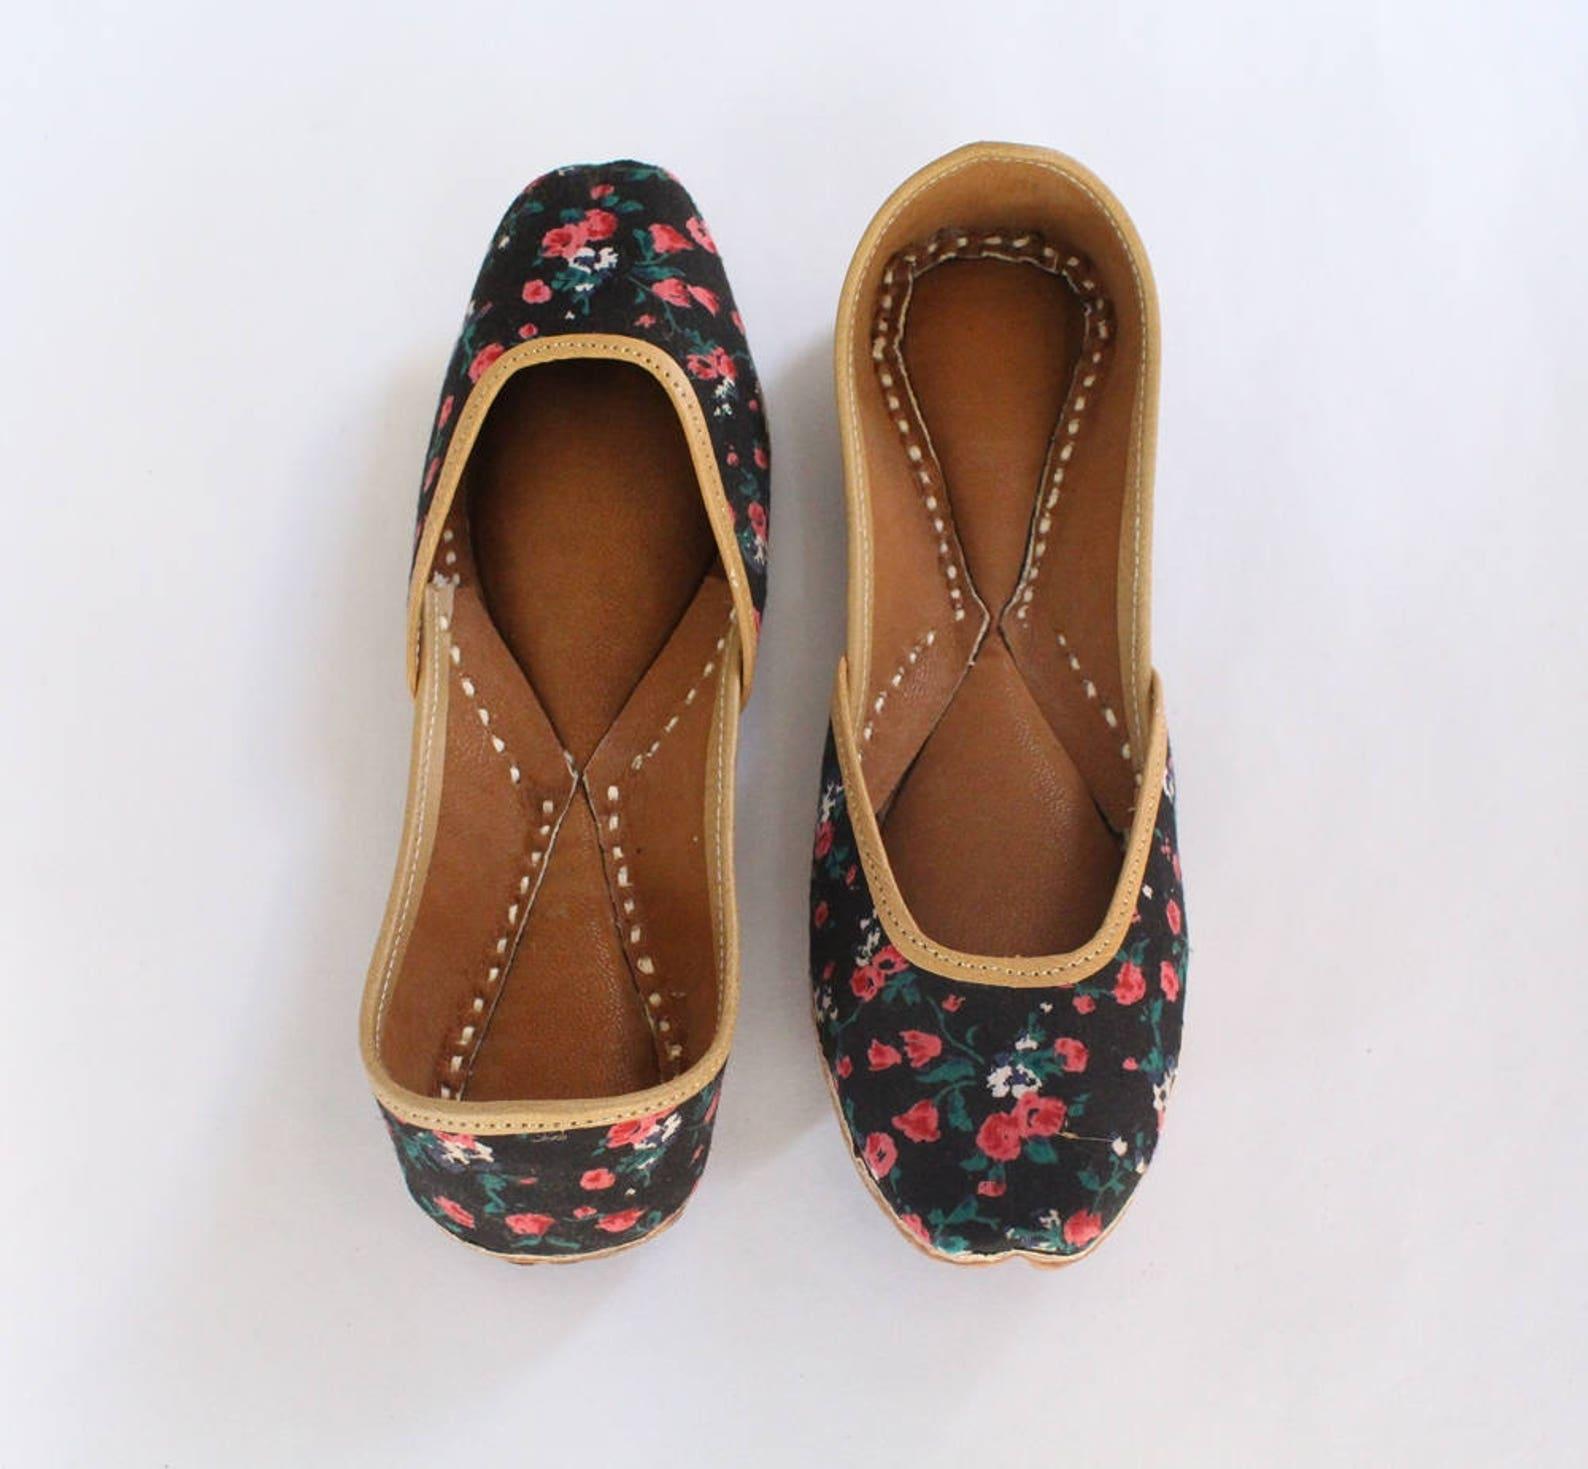 women shoes/punjabi jutti/floral flat shoes/indian leather shoes/ballet flats/muslim shoes/handmade bridal khussa women sandals